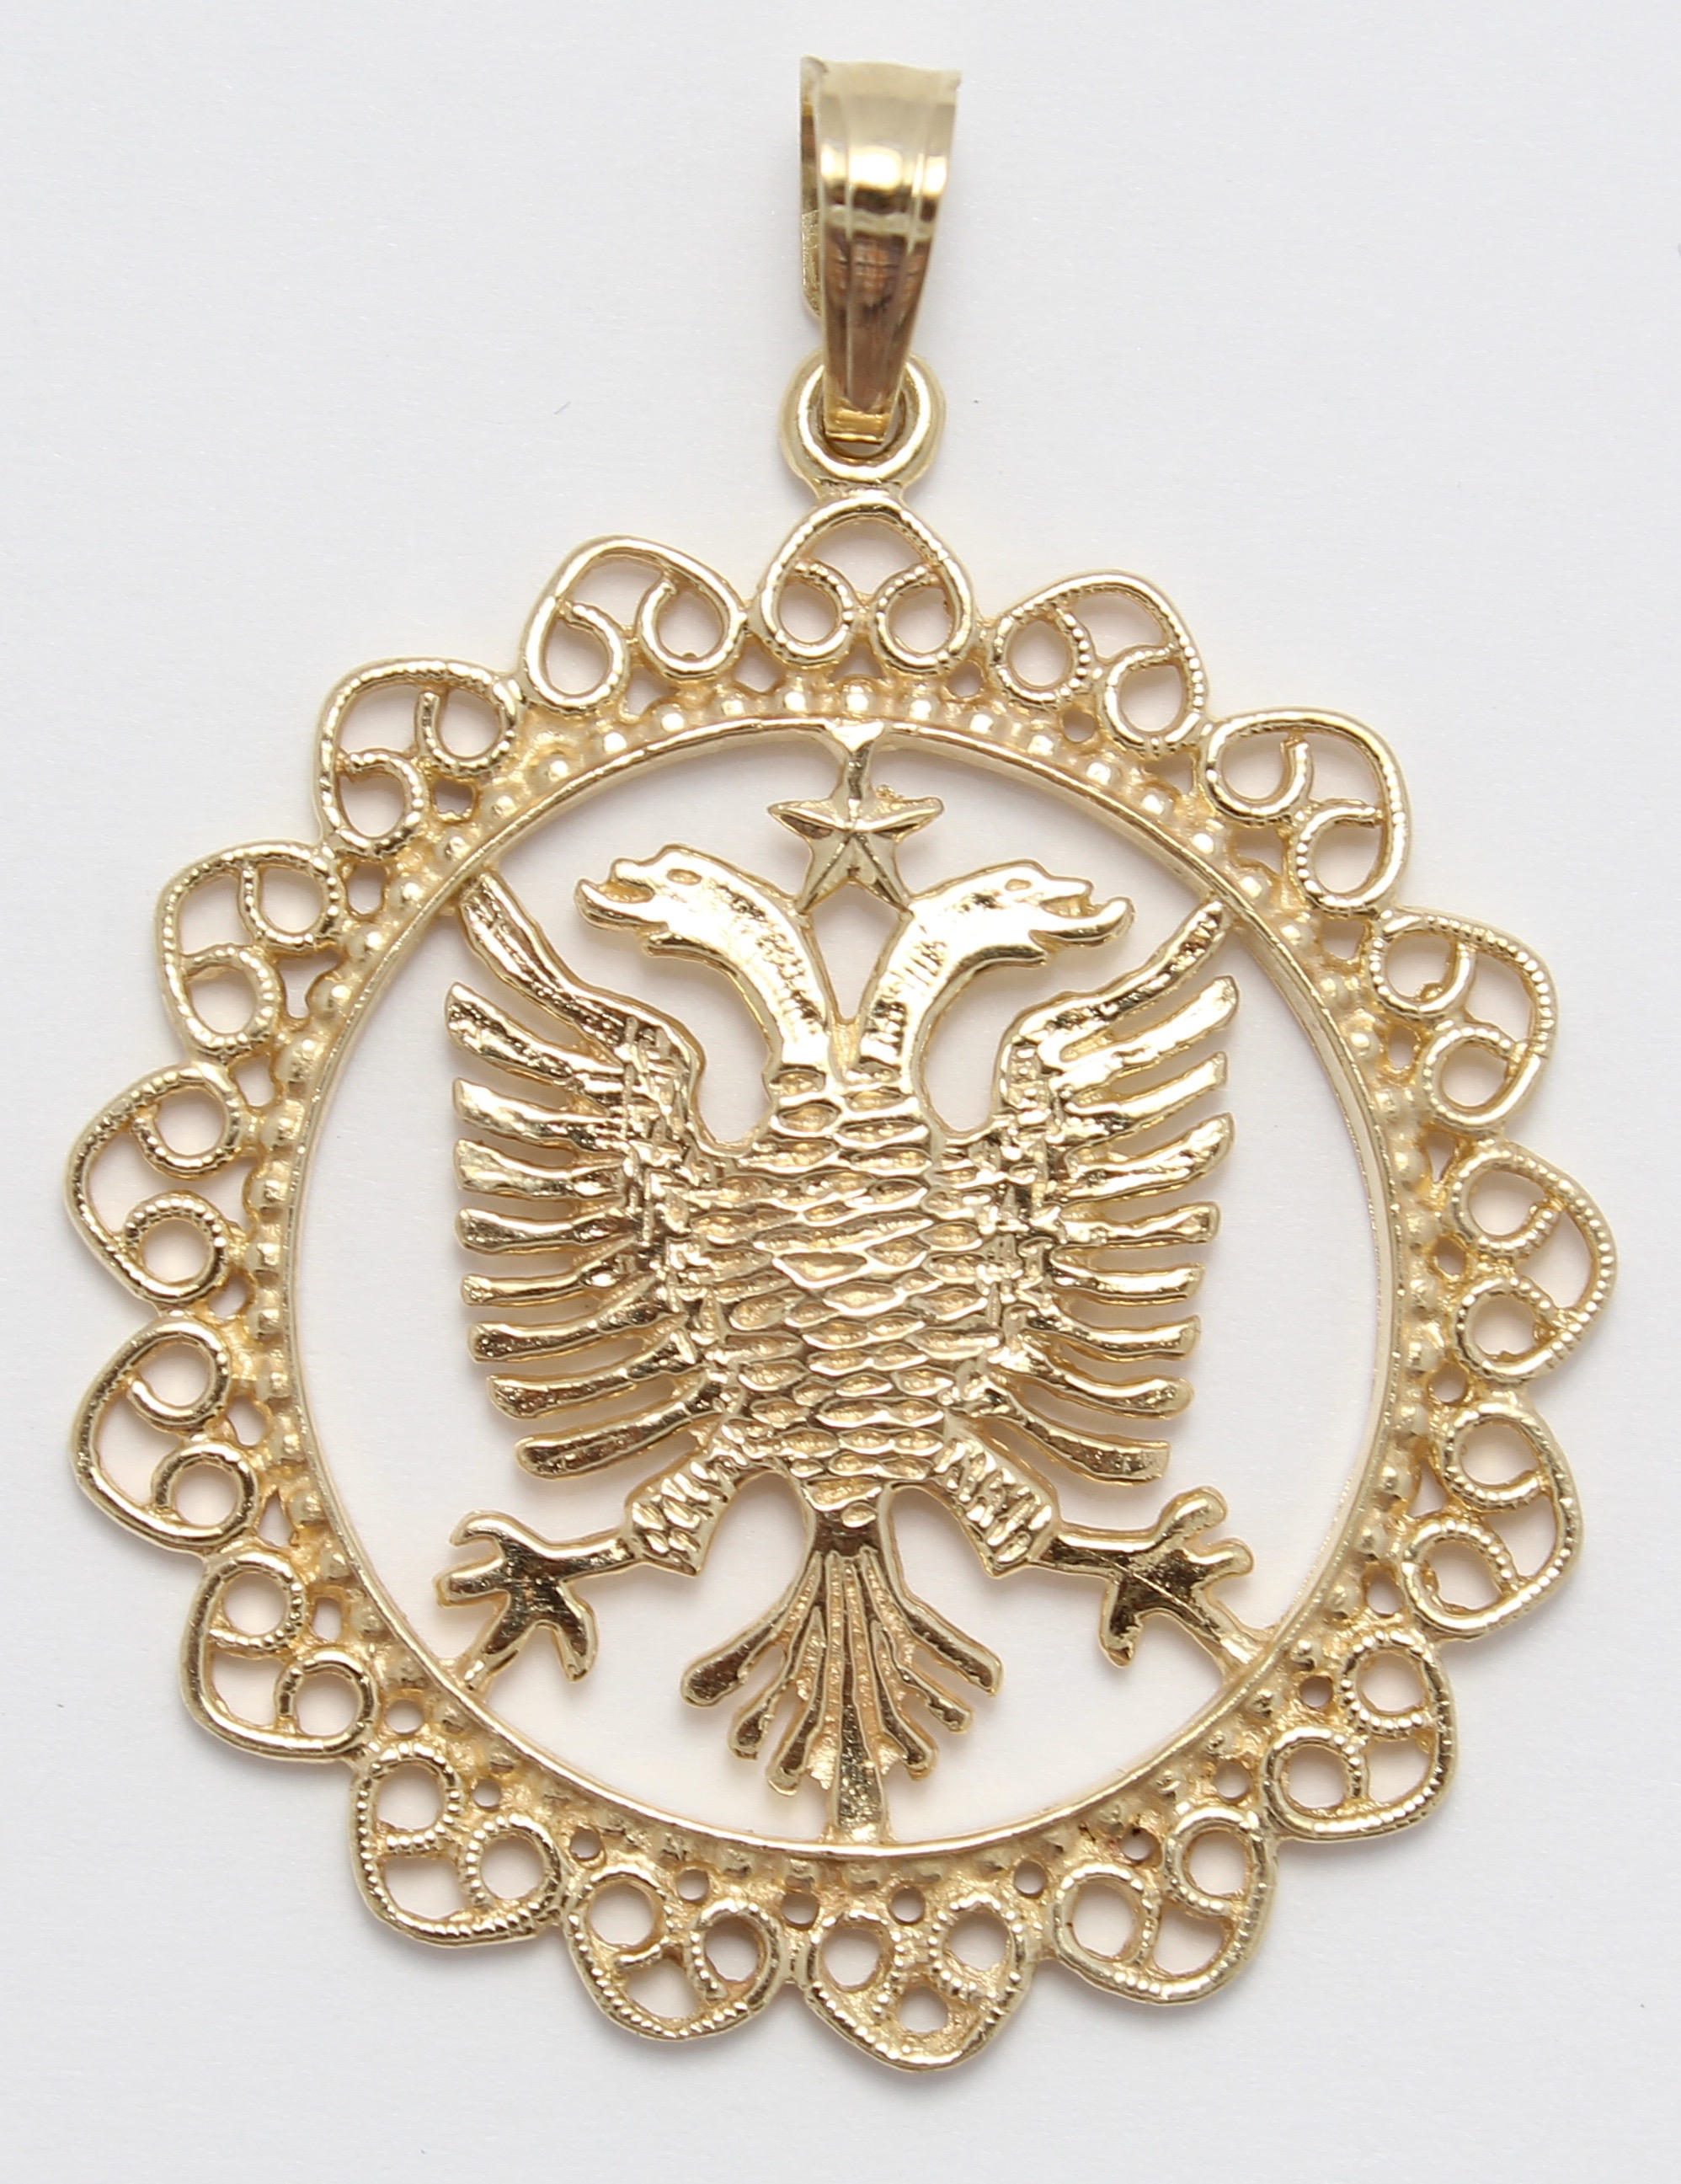 14k yellow gold albanian flag necklace pendant ebay